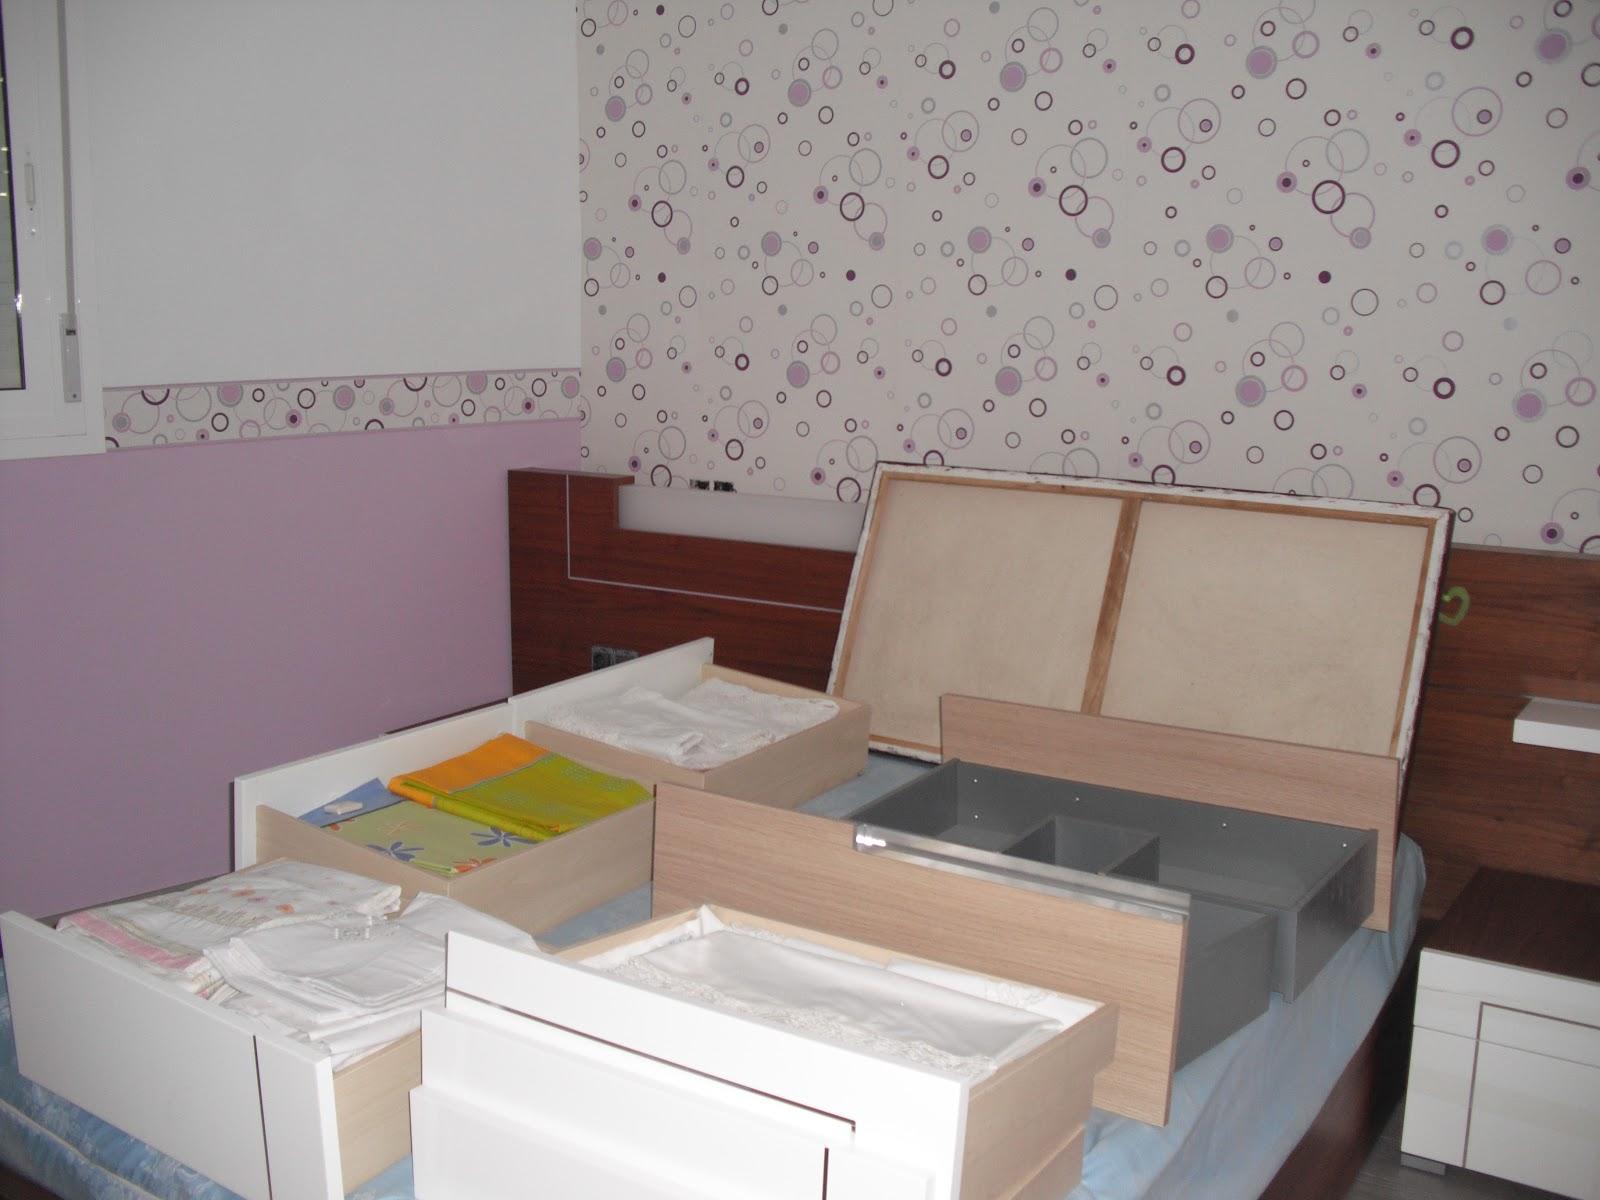 Encalarte aplicaciones decorativas empapelado de for Aplicacion para buscar habitacion